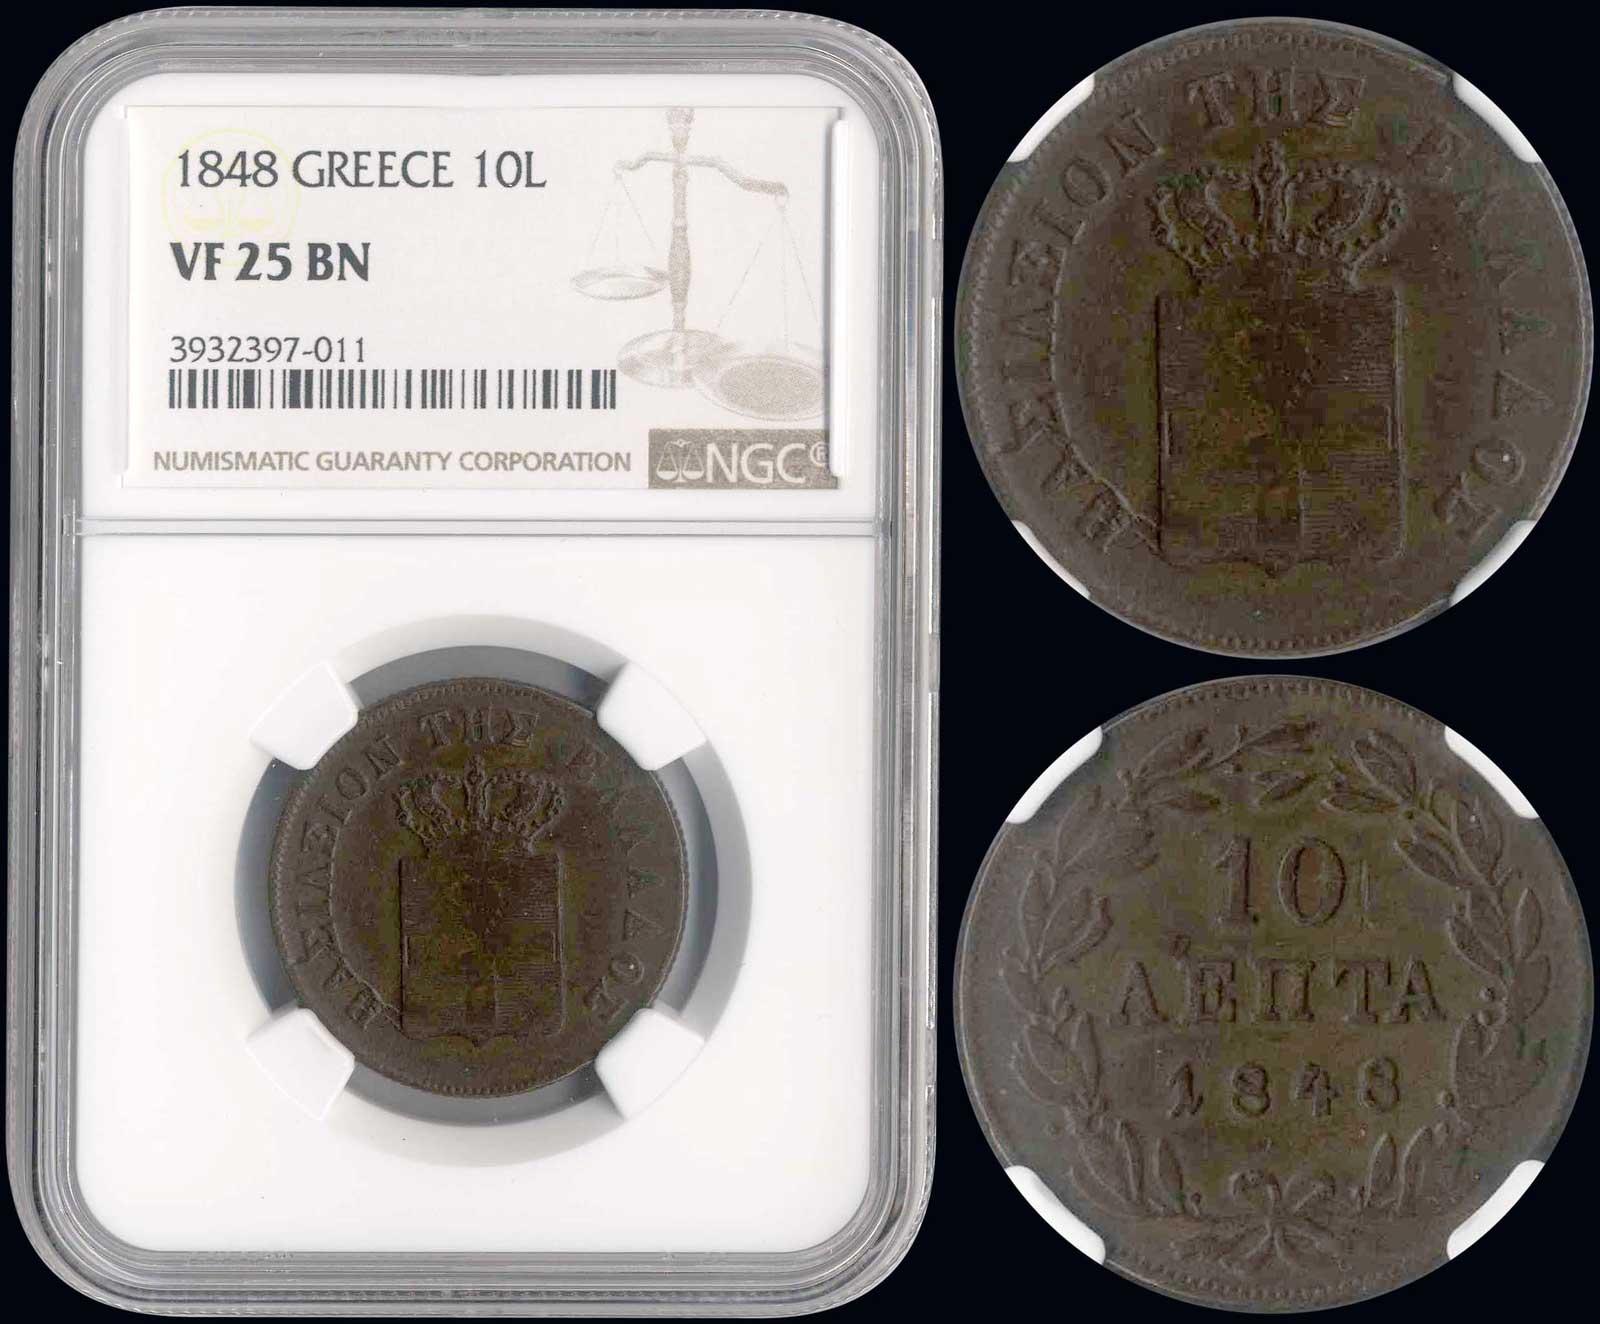 Lot 9068 - GREECE-  COINS & TOKENS king otto -  A. Karamitsos Public & LIVE Bid Auction 610 Coins, Medals & Banknotes